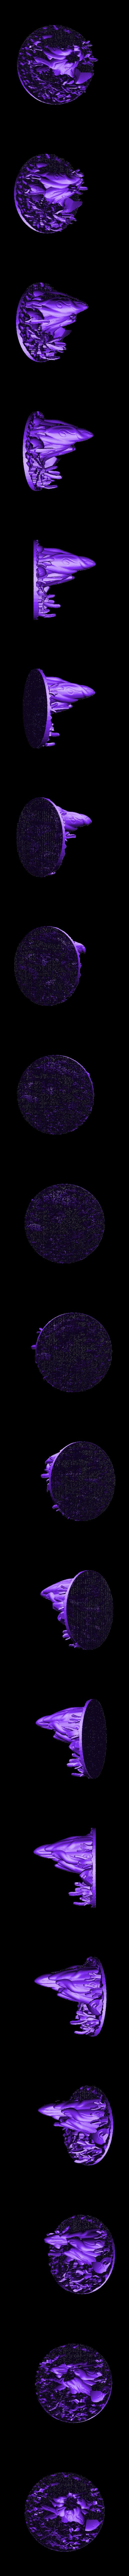 Stump_0.1.2.stl Download free STL file OpenFoliage Stump - 40 mm base • 3D printable design, BellForged